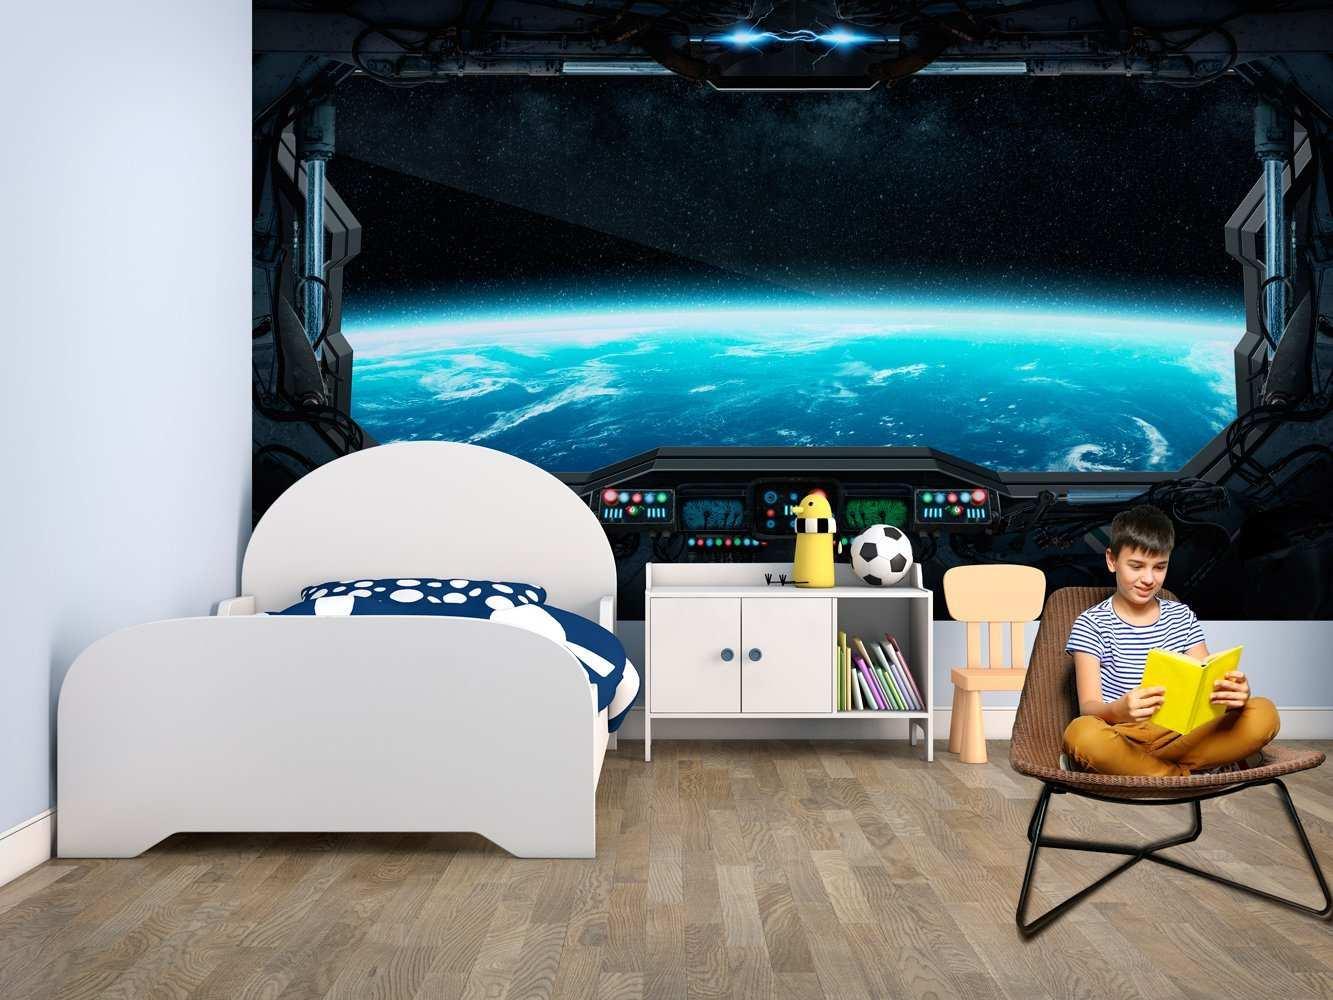 Fotomural Vinilo Infantil Futurista Vistas Espaciales | Carteles XXL - Impresión carteleria publicitaria